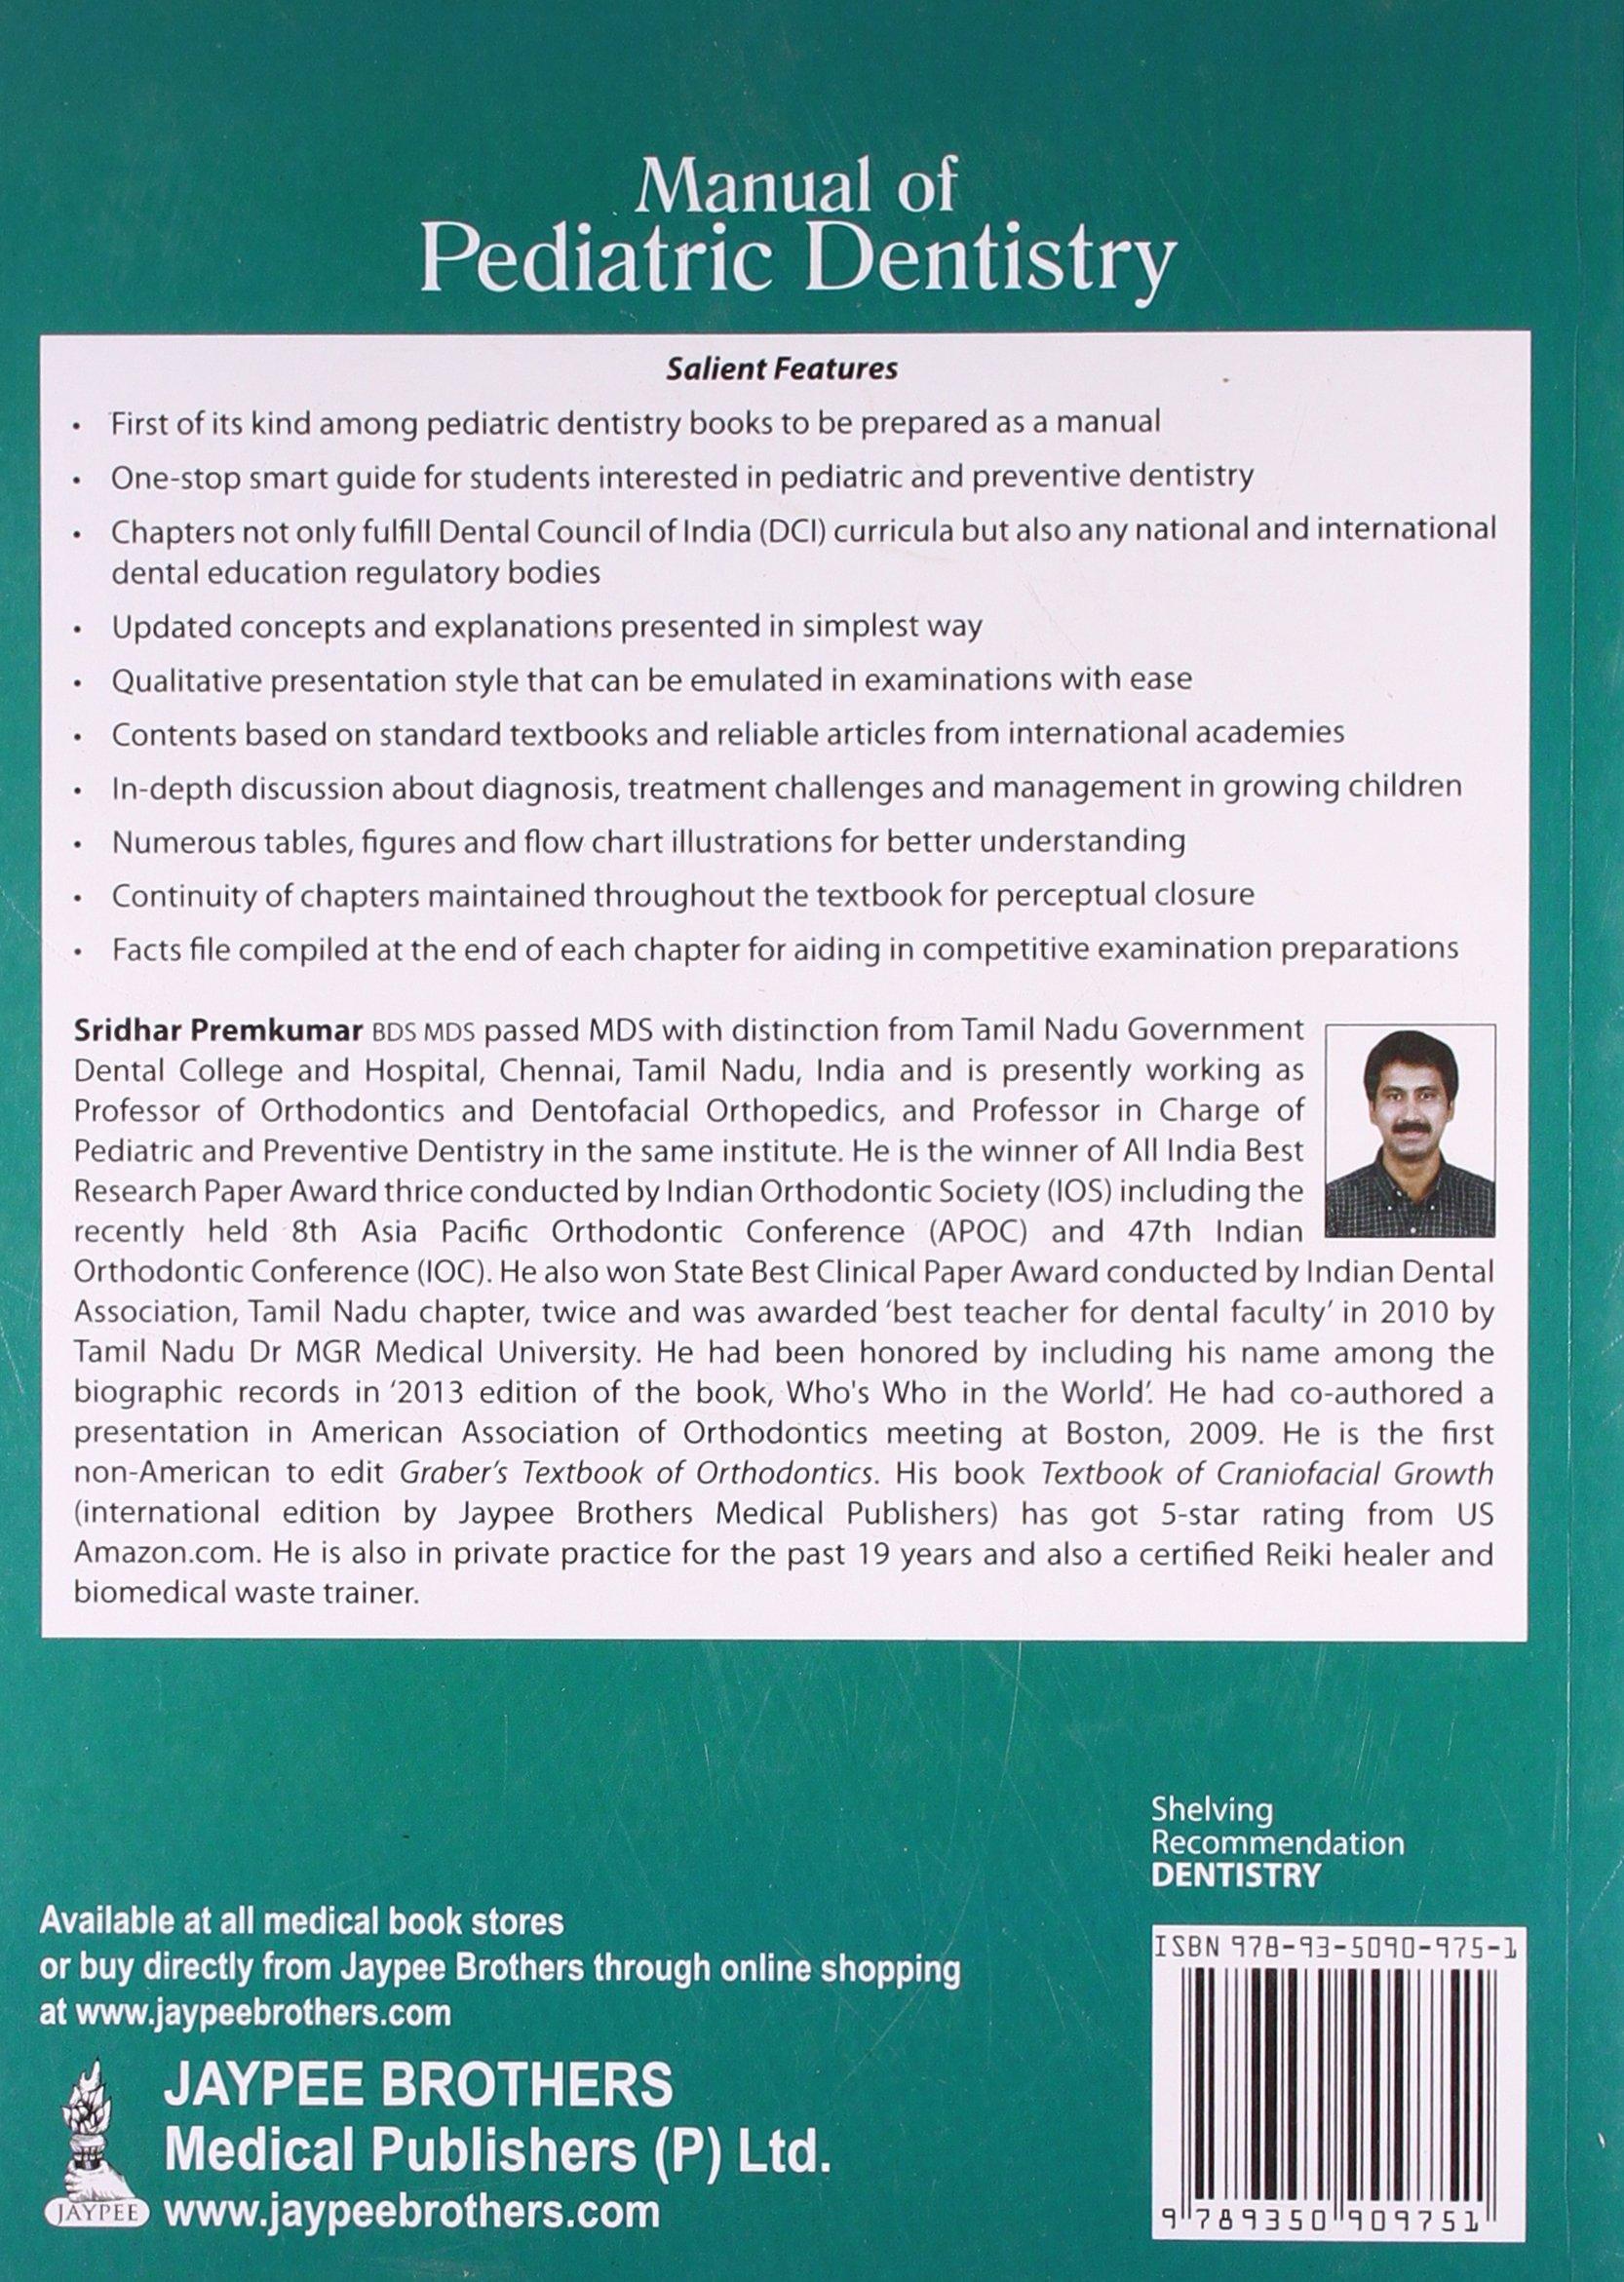 Manual of Pediatric Dentistry: Sridhar Premkumar: 9789350909751 ...